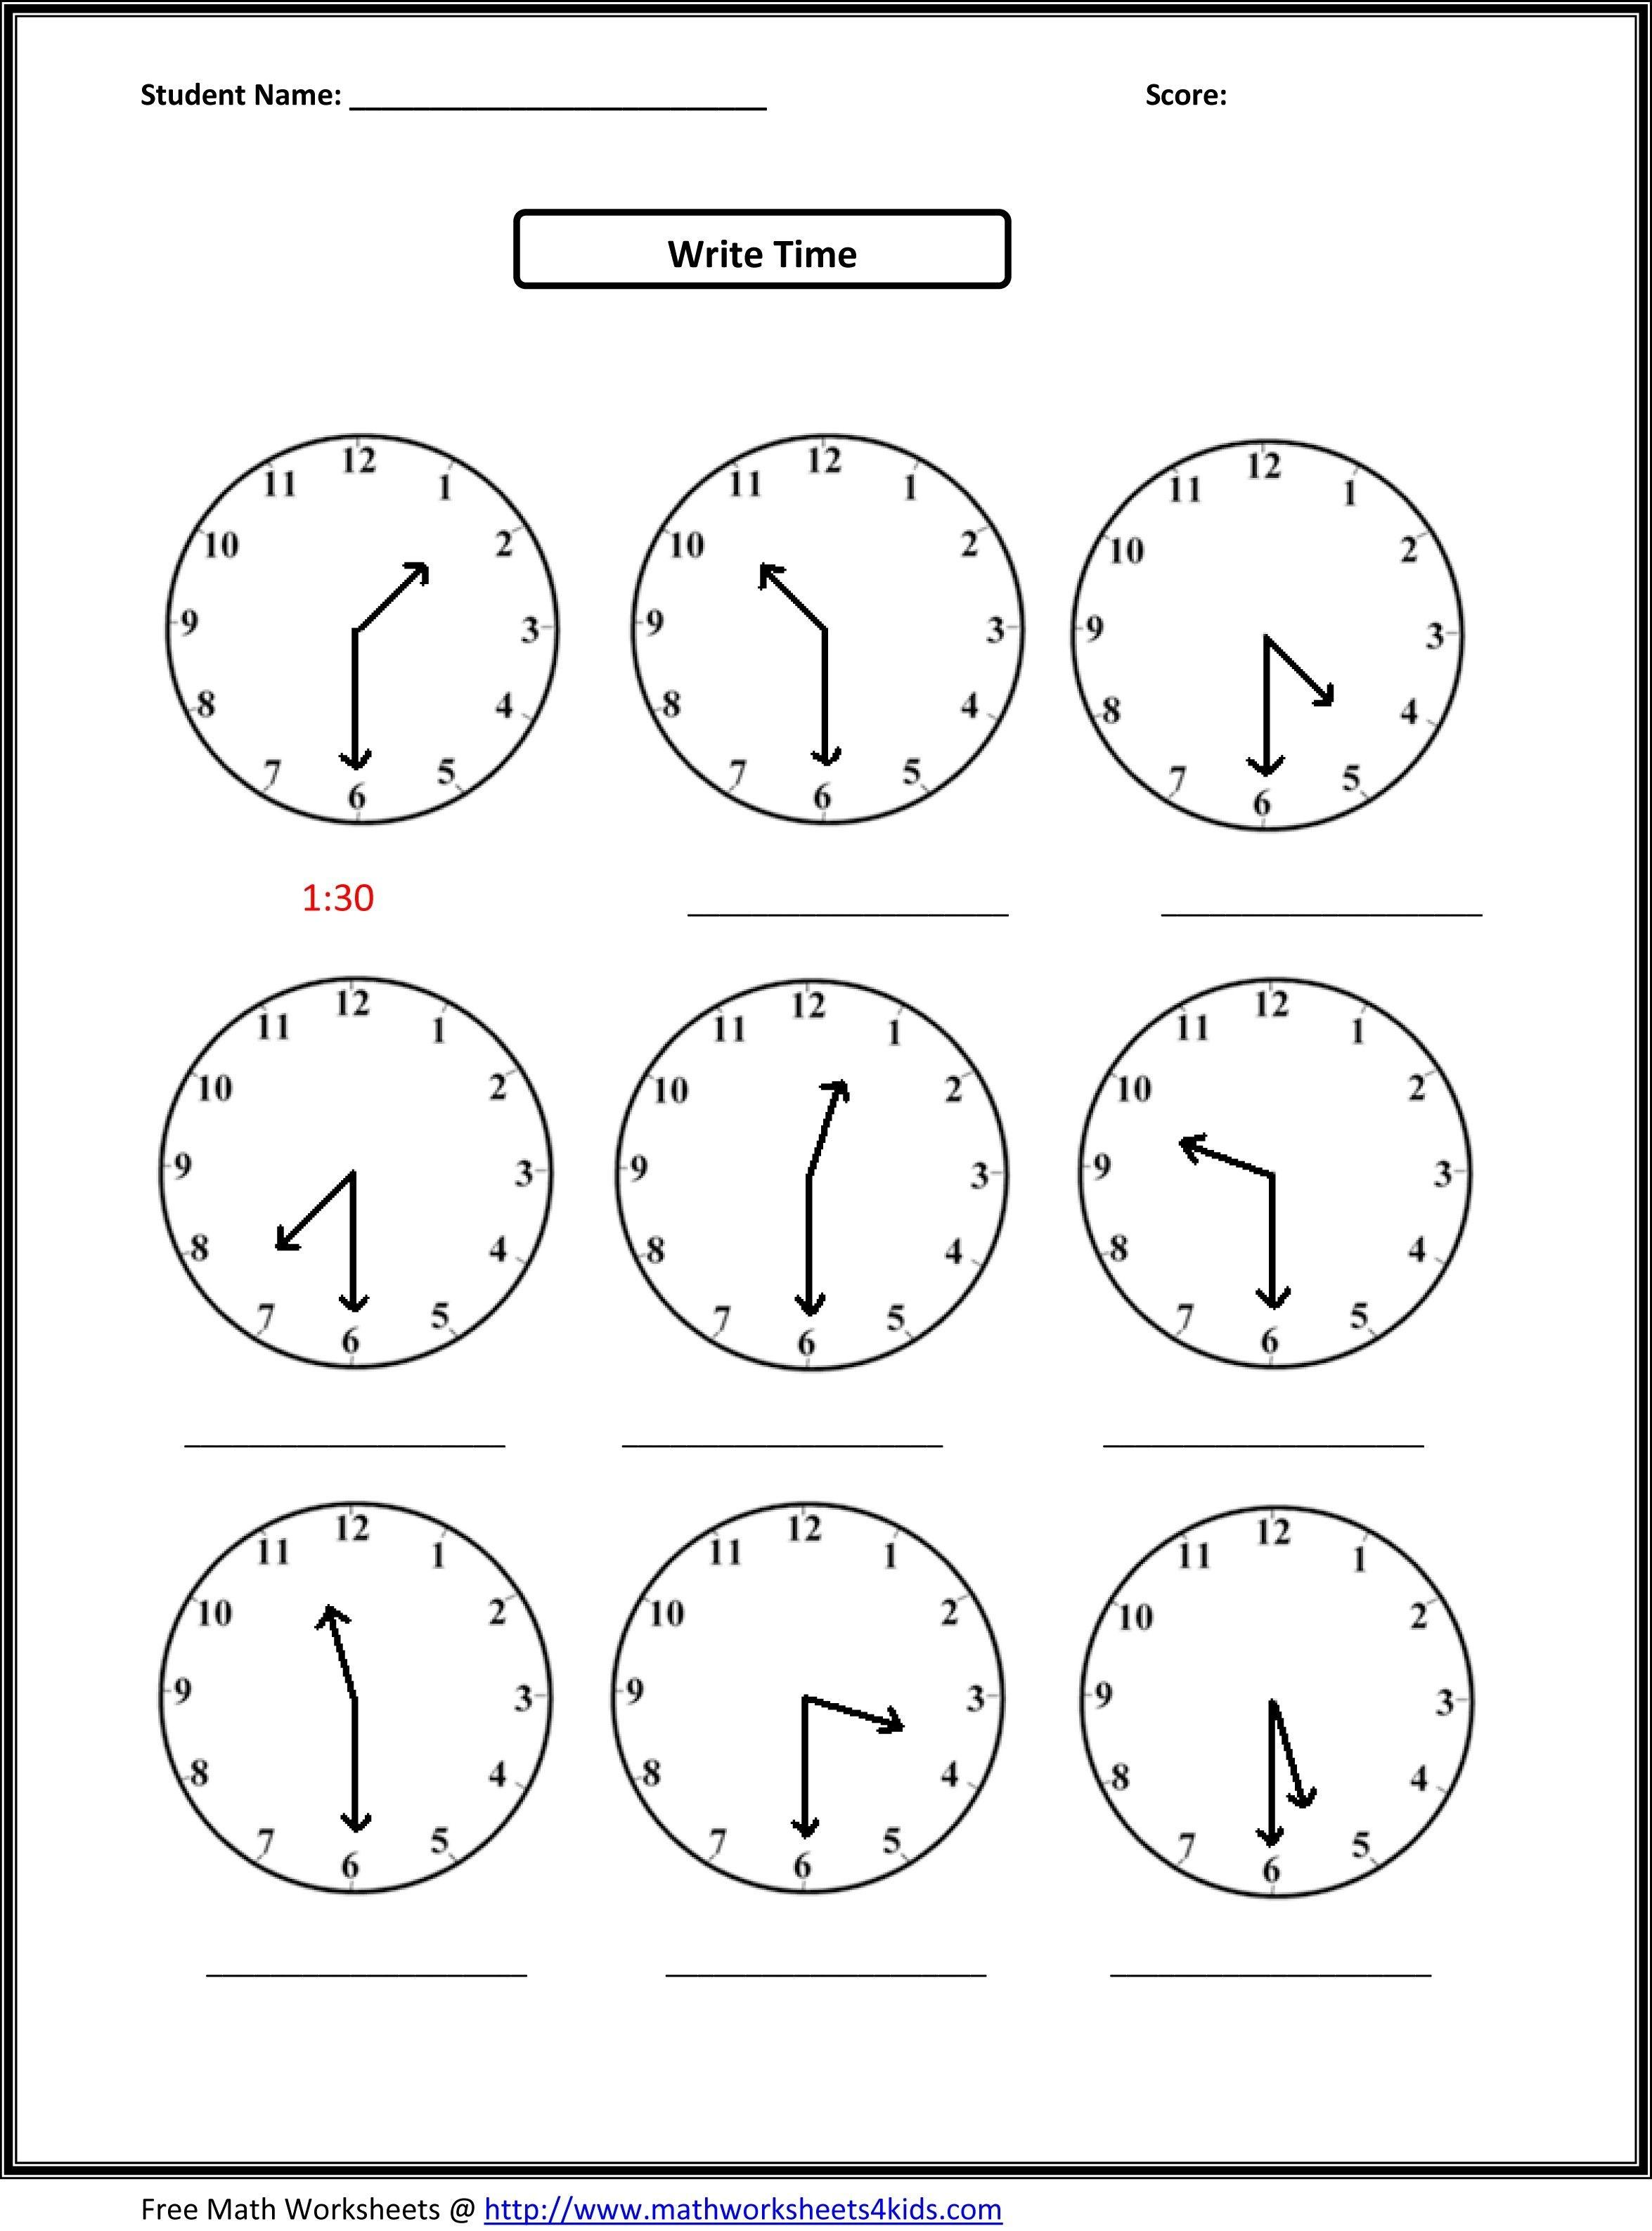 2Nd Grade Free Worksheets Math | Math: Time/measurement | 2Nd Grade - Free Printable Second Grade Worksheets